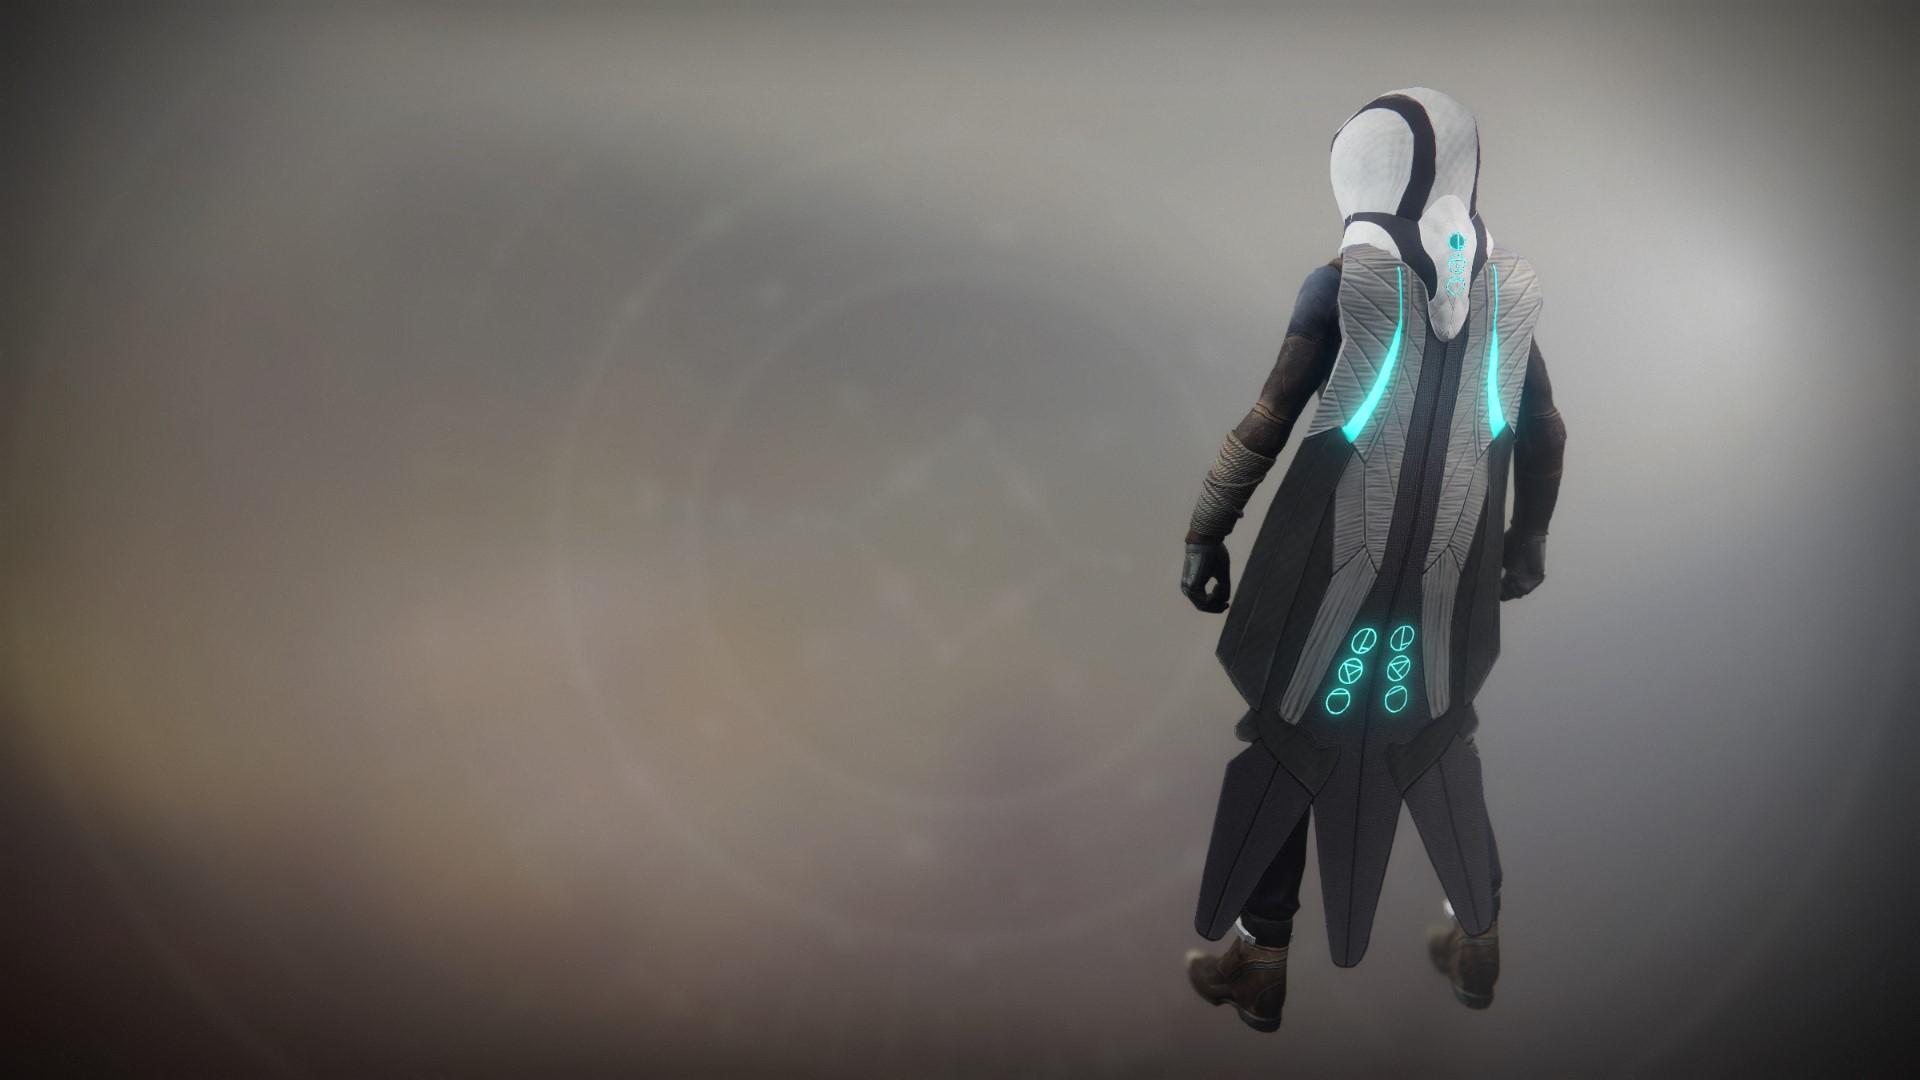 Trials Prestige Ornament Destiny 2 Legendary Armor Ornament